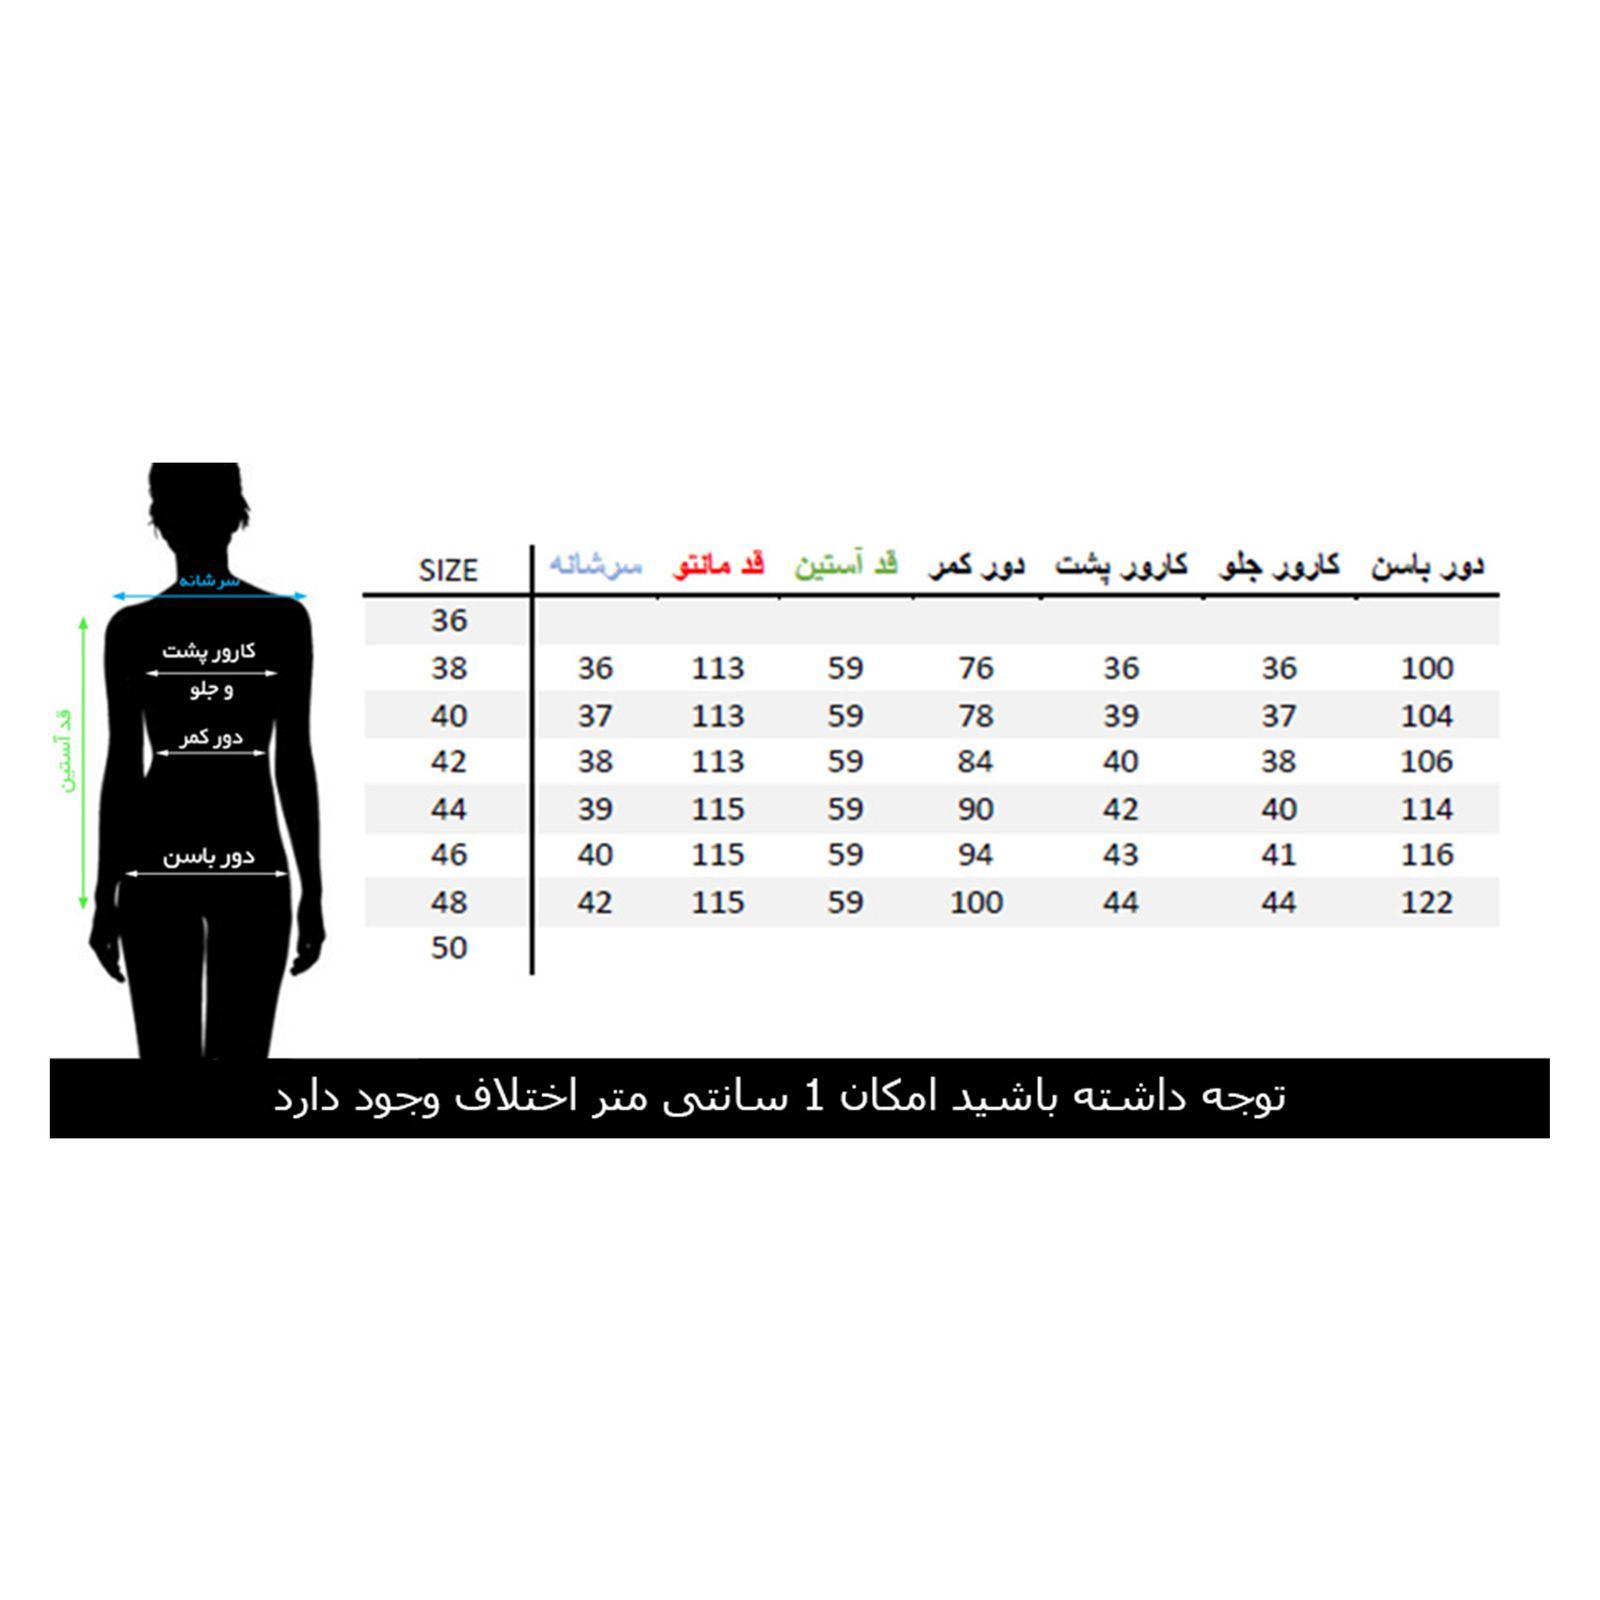 مانتو زنانه مانتو ولیعصر مدل مریلا کد 61001 -  - 5